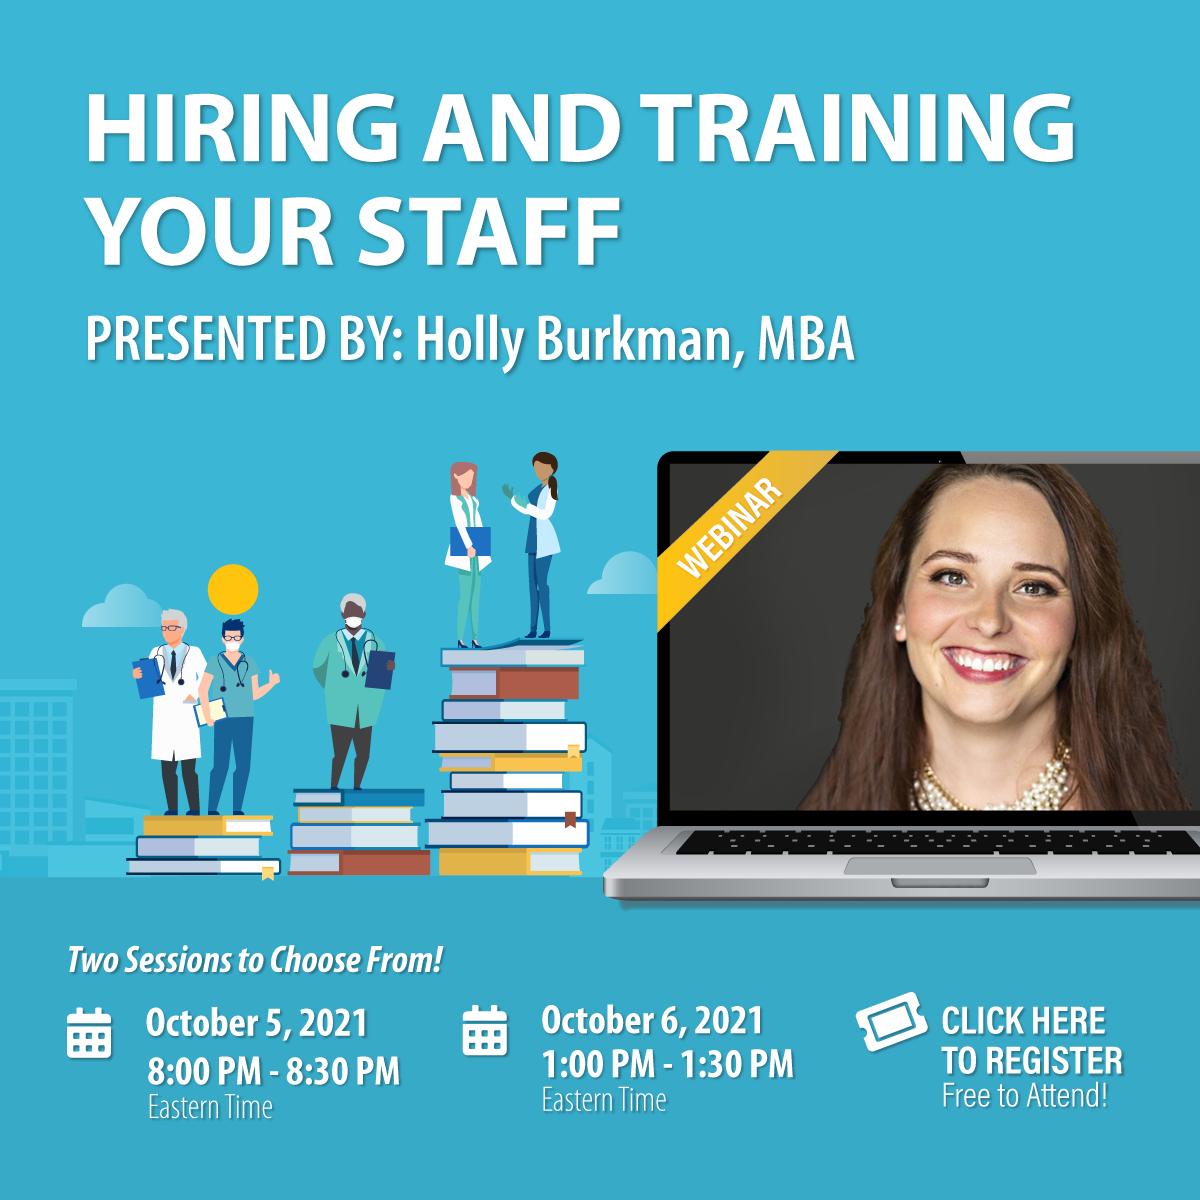 Webinar: Hiring and Training Your Staff